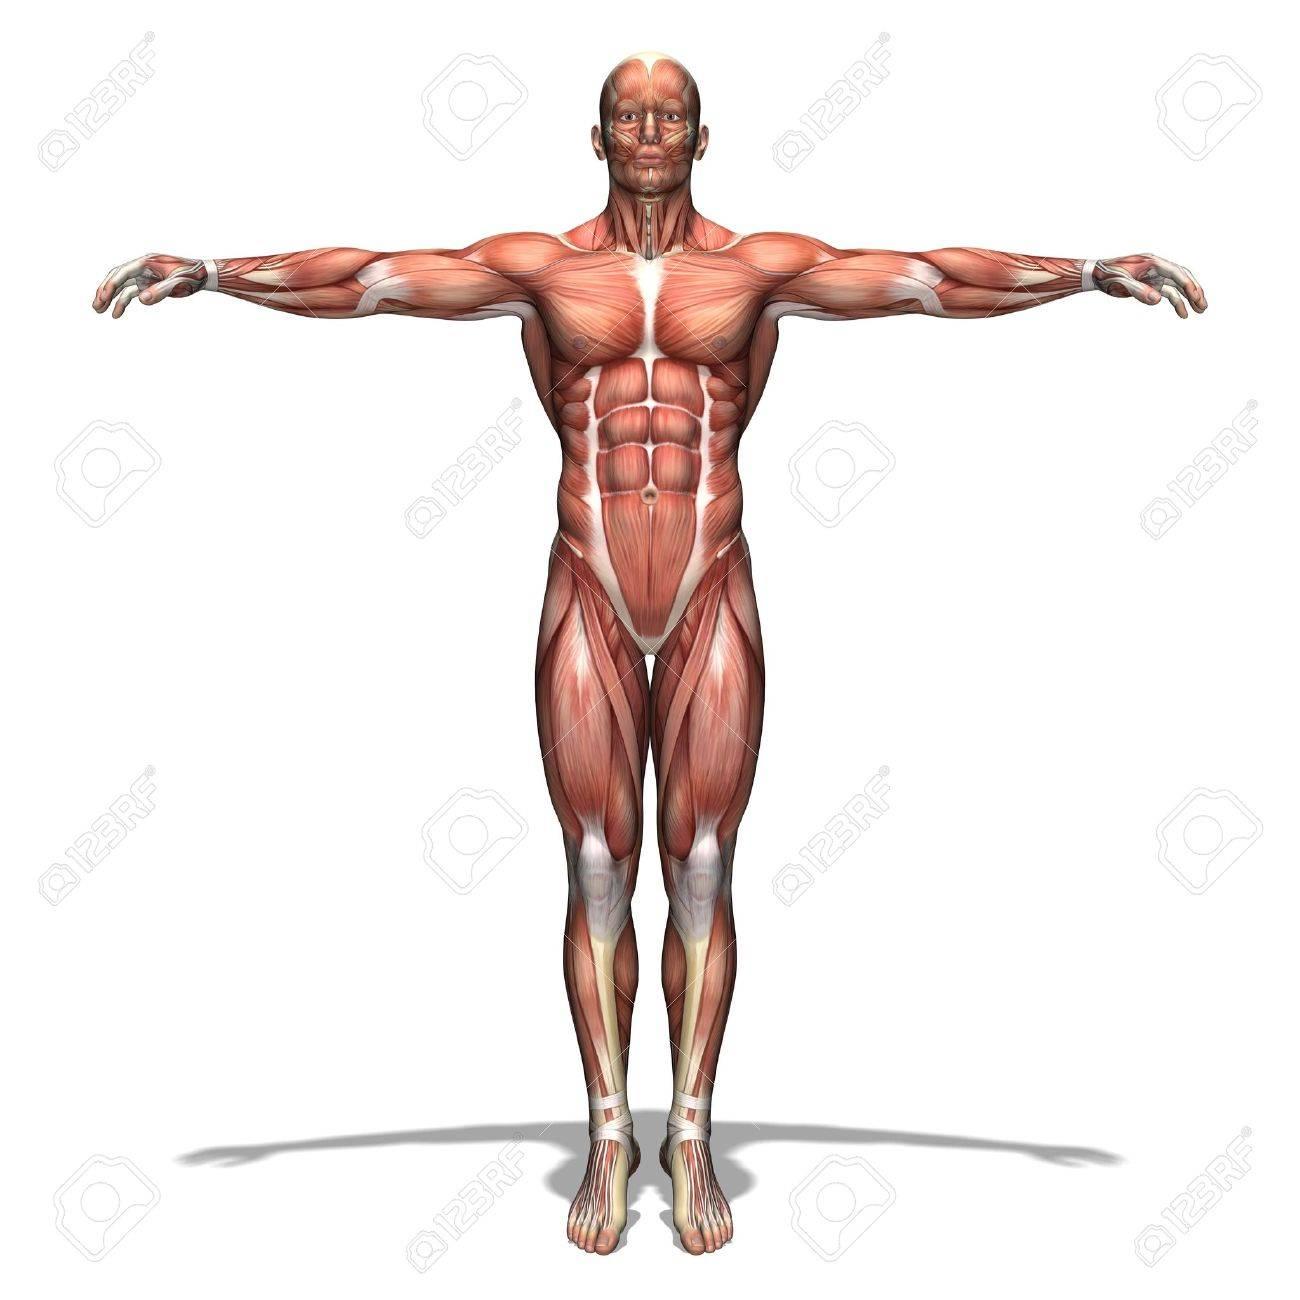 human body Stock Photo - 13385760